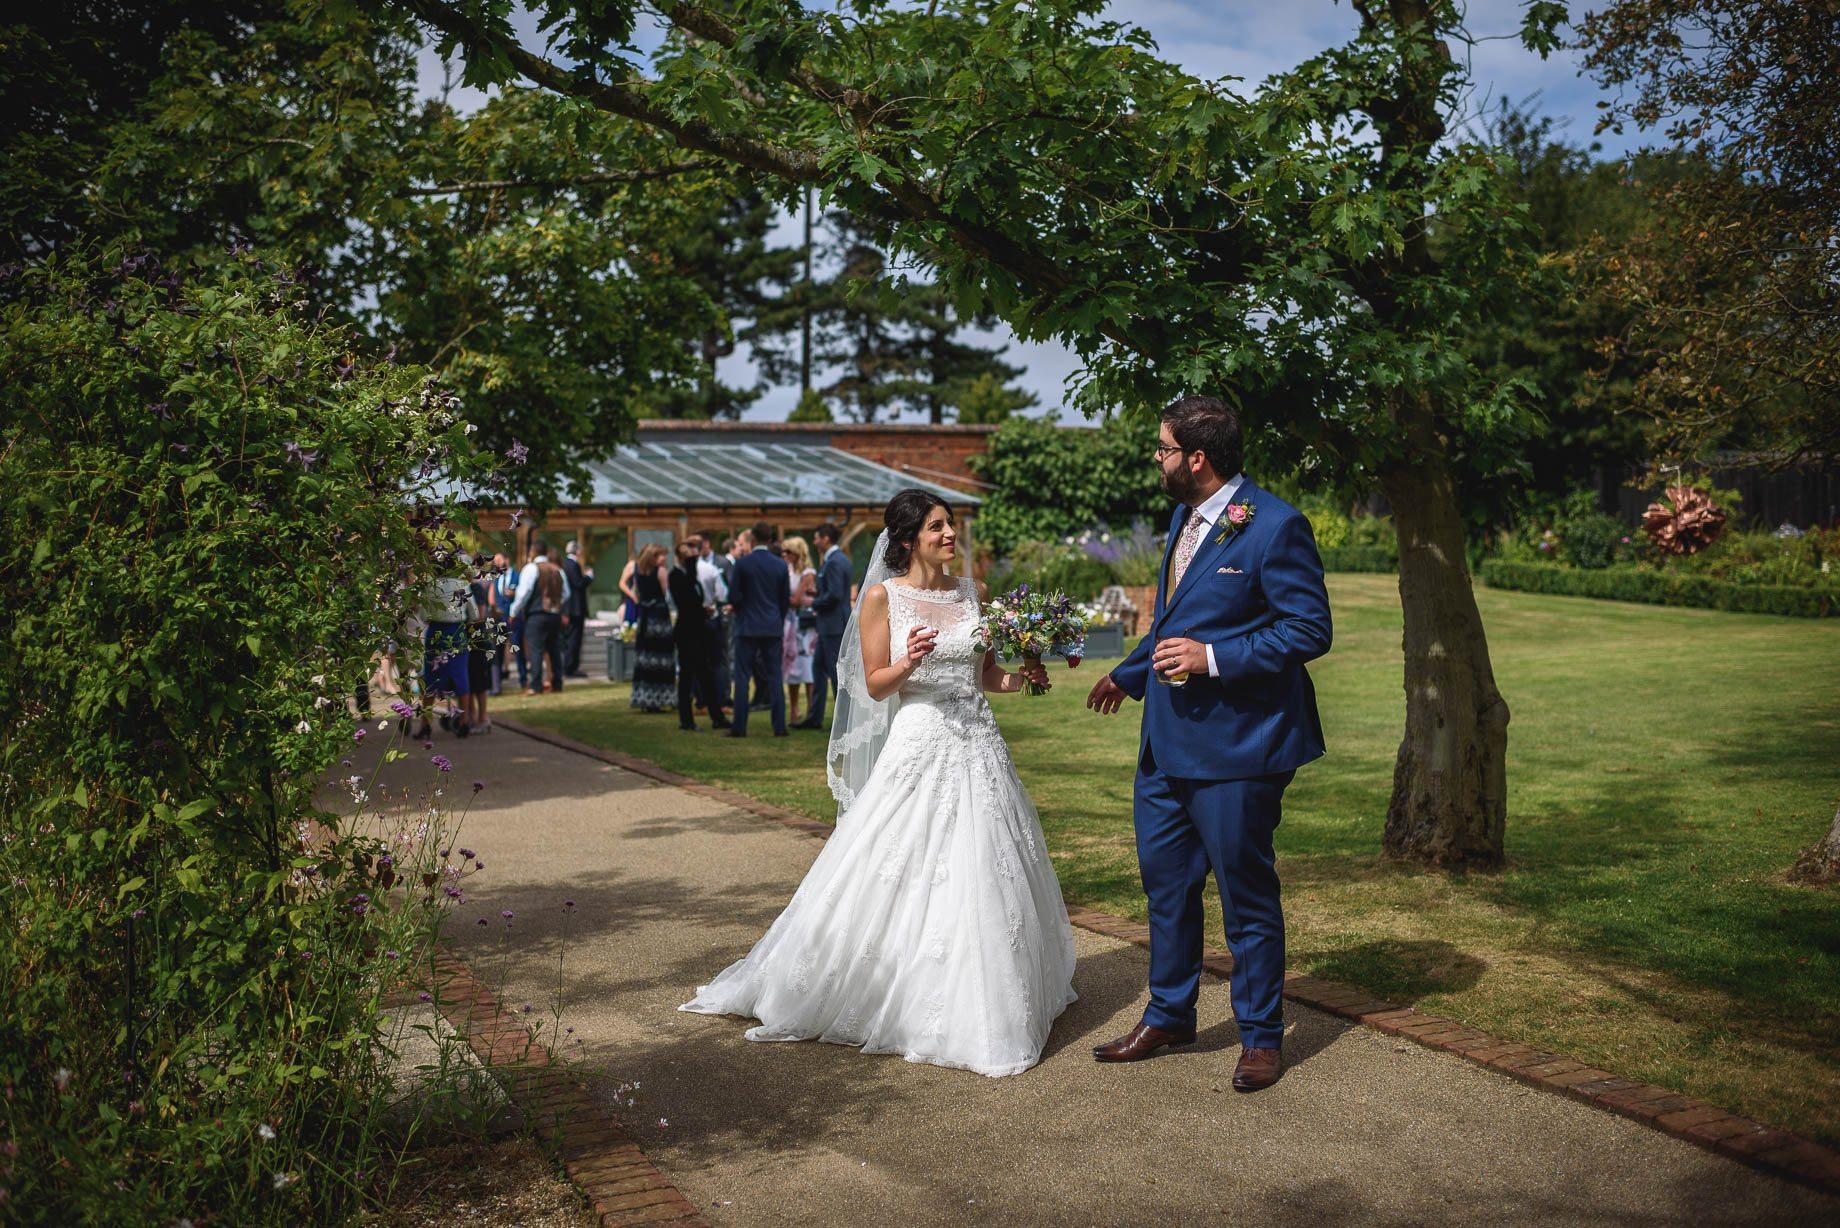 Gaynes Park wedding photography - Guy Collier Photography - Rachel and Jon (94 of 169)